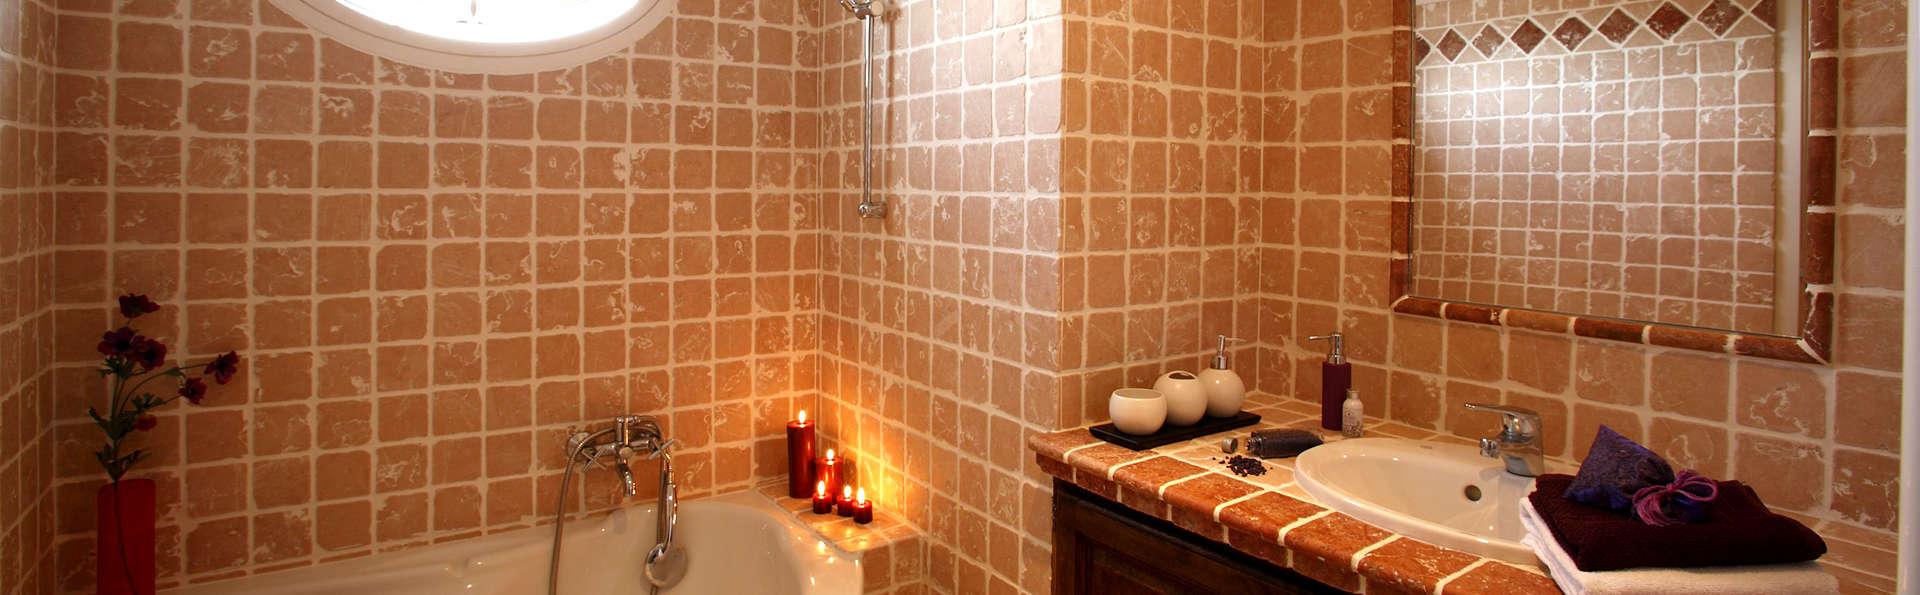 Pierre et Vacances Hôtel du Golf - Pont Royal - Edit_Bathroom.jpg